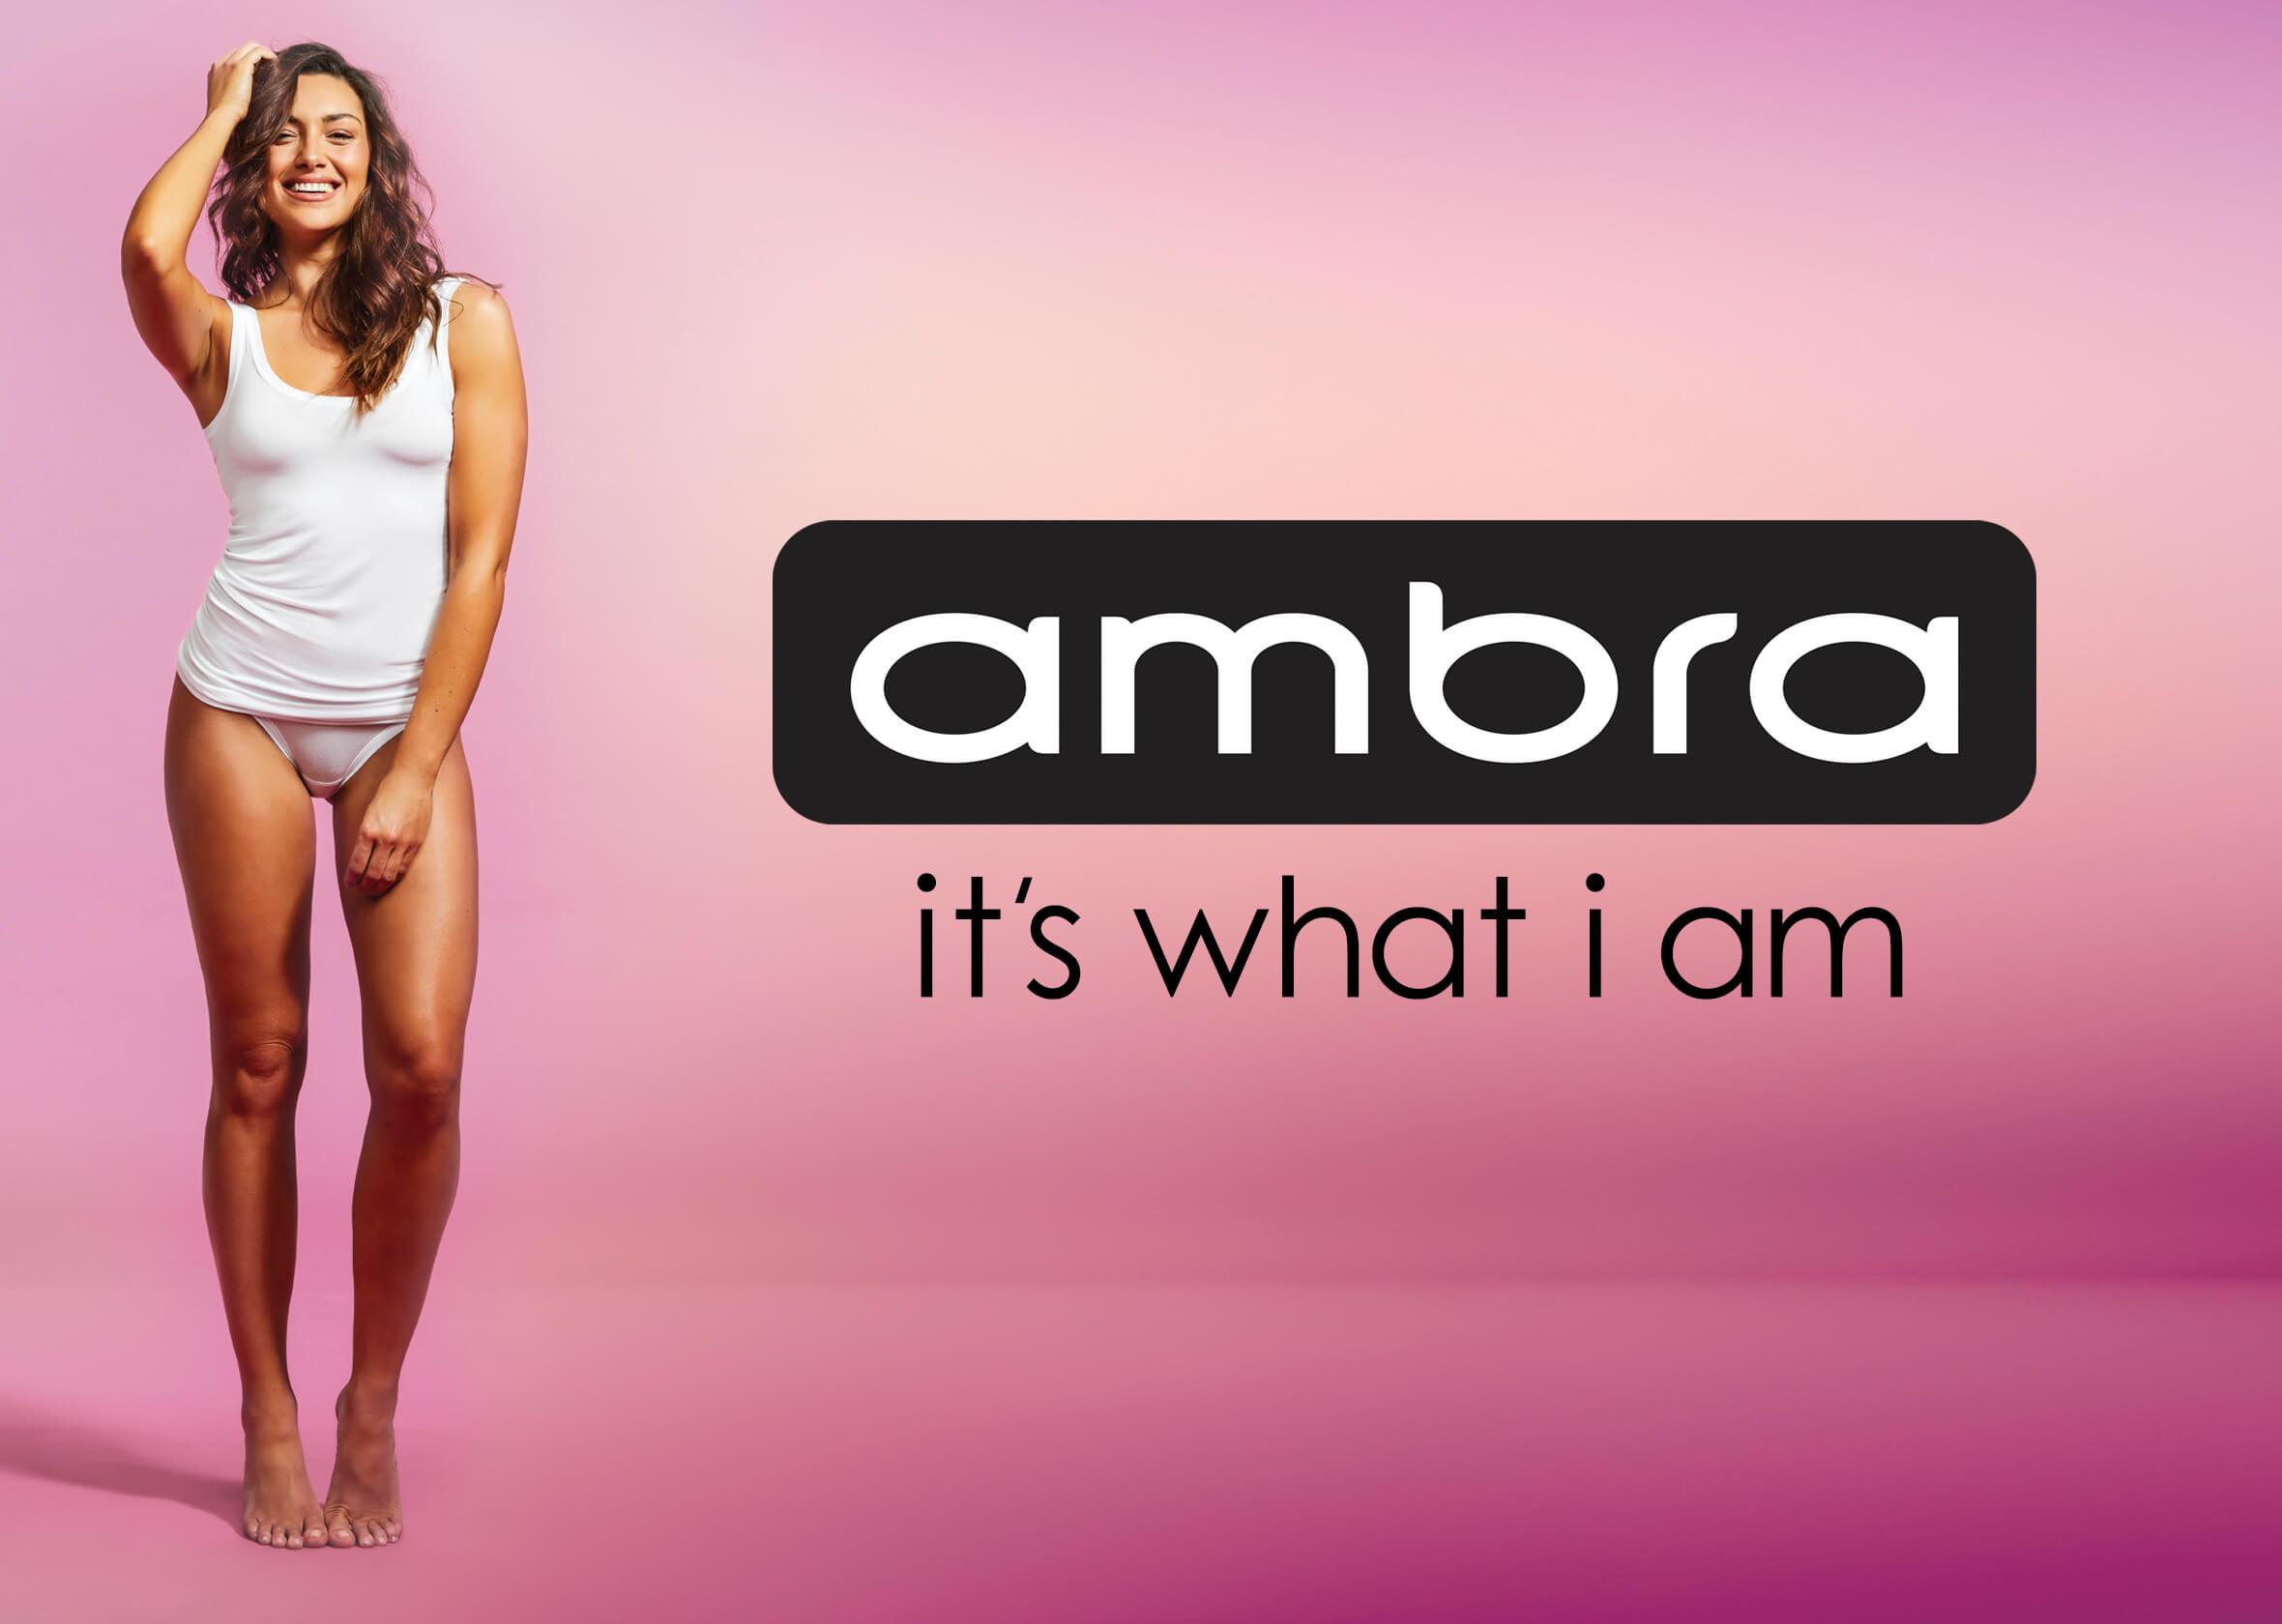 1 AMBRA 1